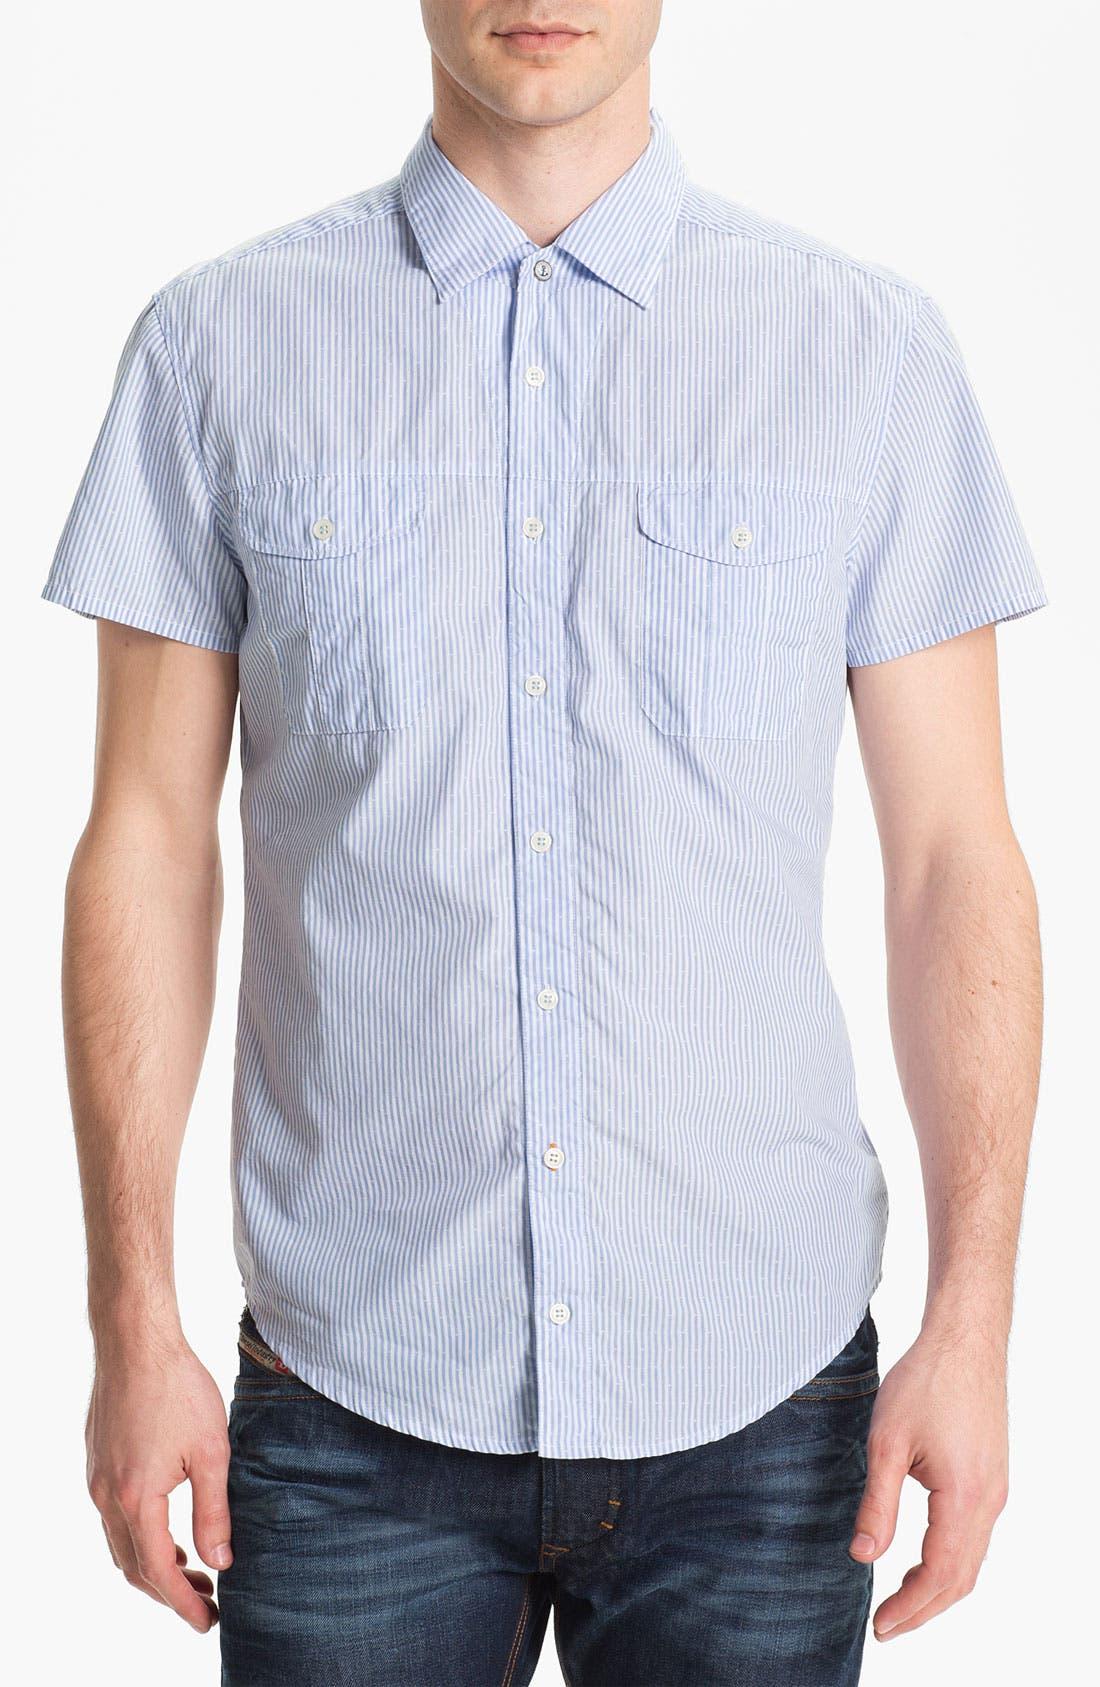 Main Image - BOSS Orange 'Casoe' Stripe Woven Shirt